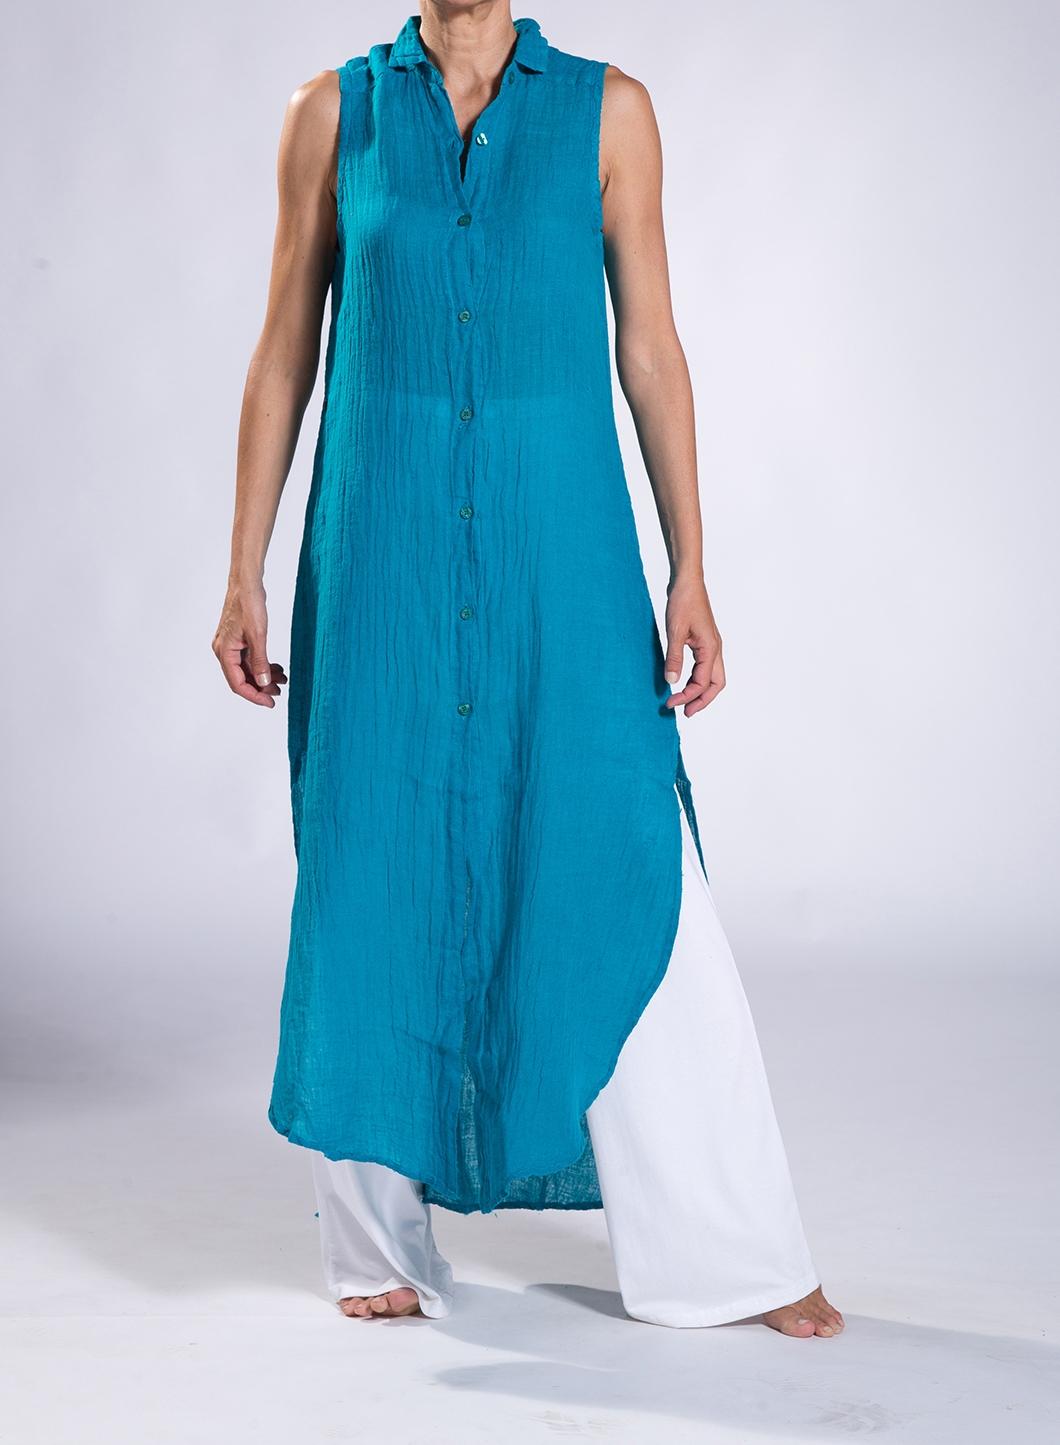 a3c709916349 Φόρεμα Σεμιζιέ Summer χωρίς μανίκι 100% λινή γάζα - JOIN CLOTHES